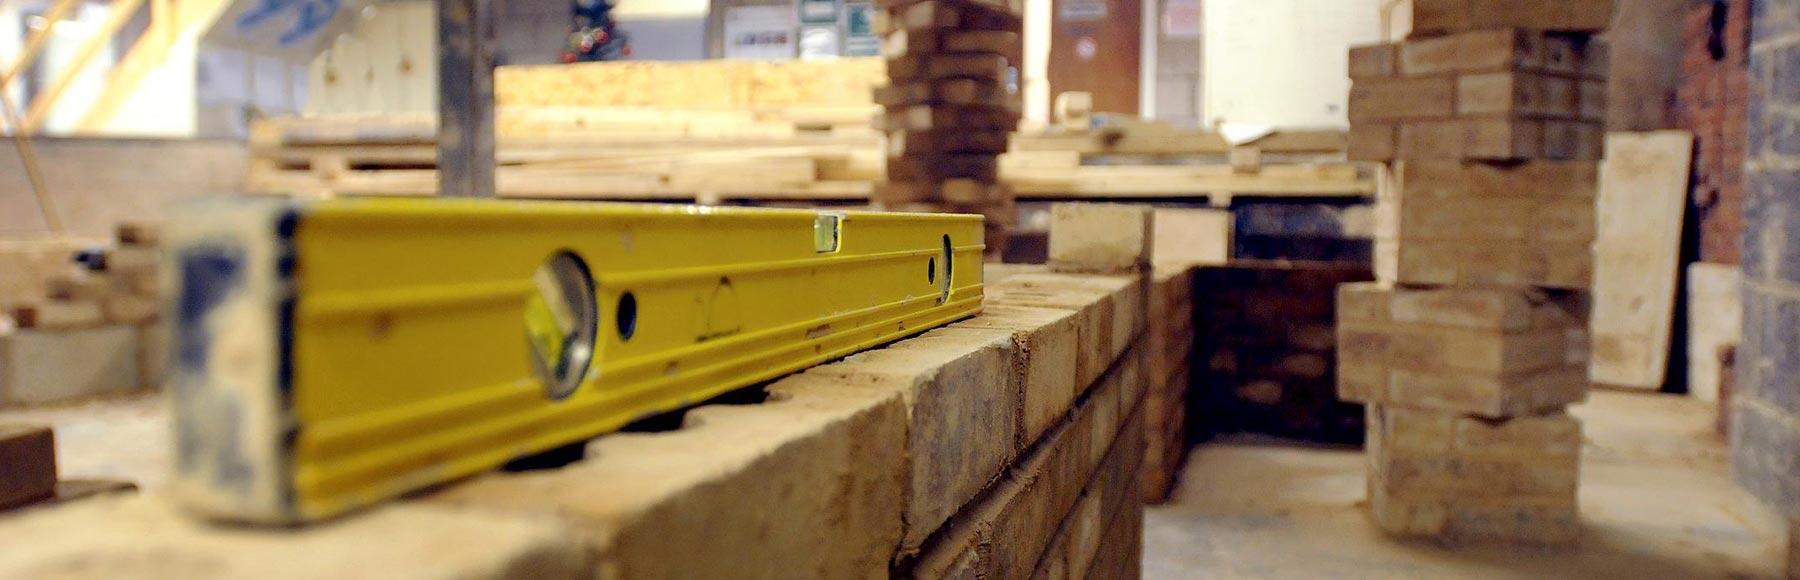 brickwork_1